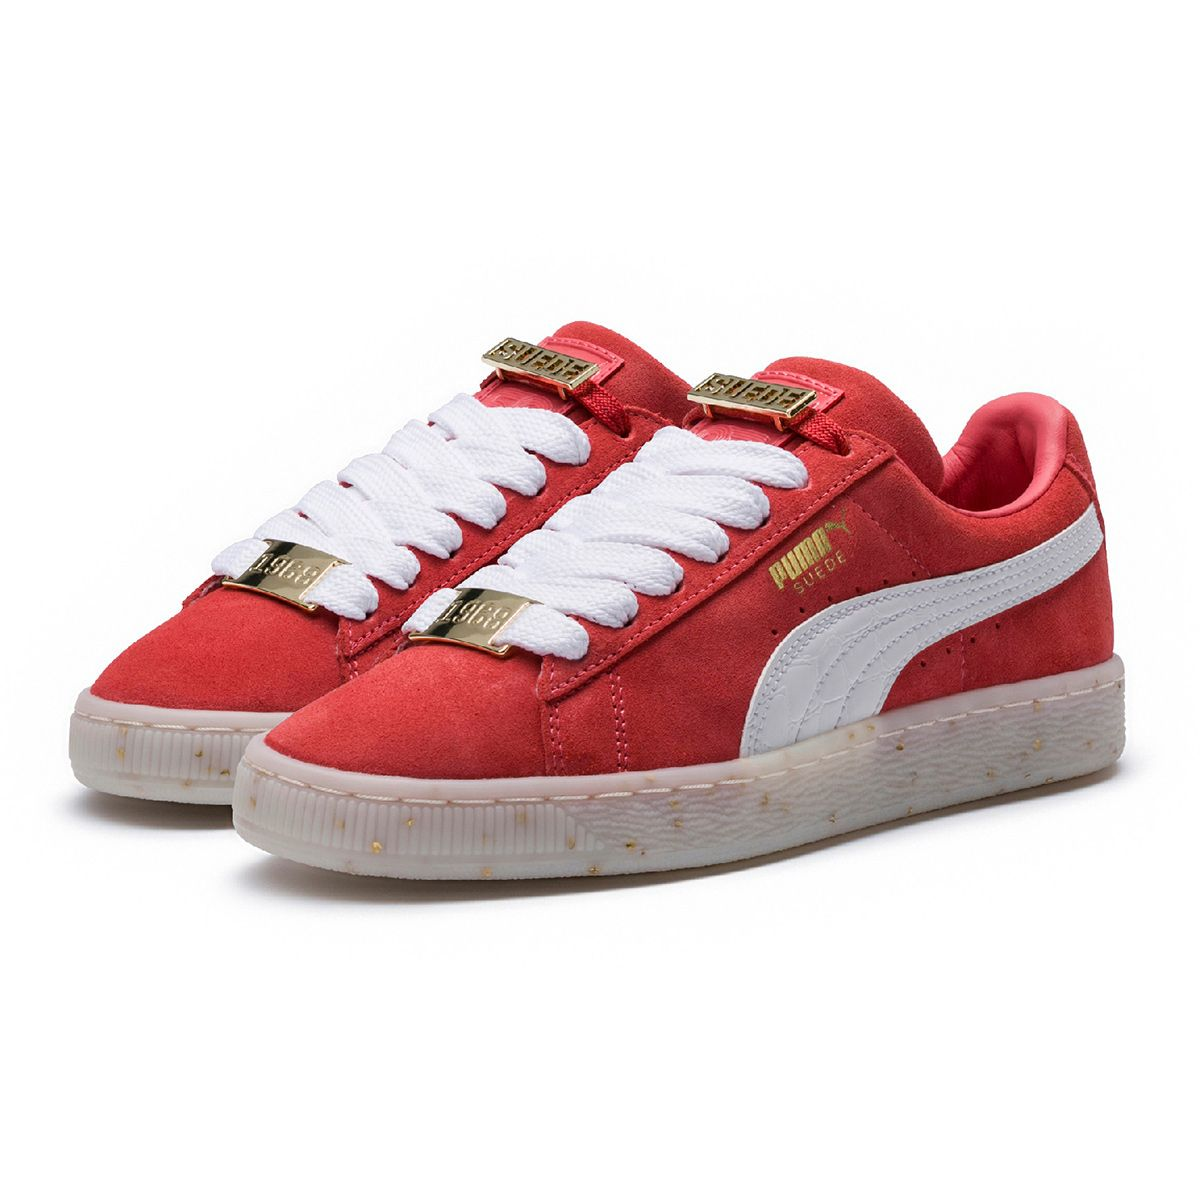 huge selection of b0531 9c57c Tênis Puma Suede Classic Bboy Fab - Vermelho in 2019 | Shoes ...